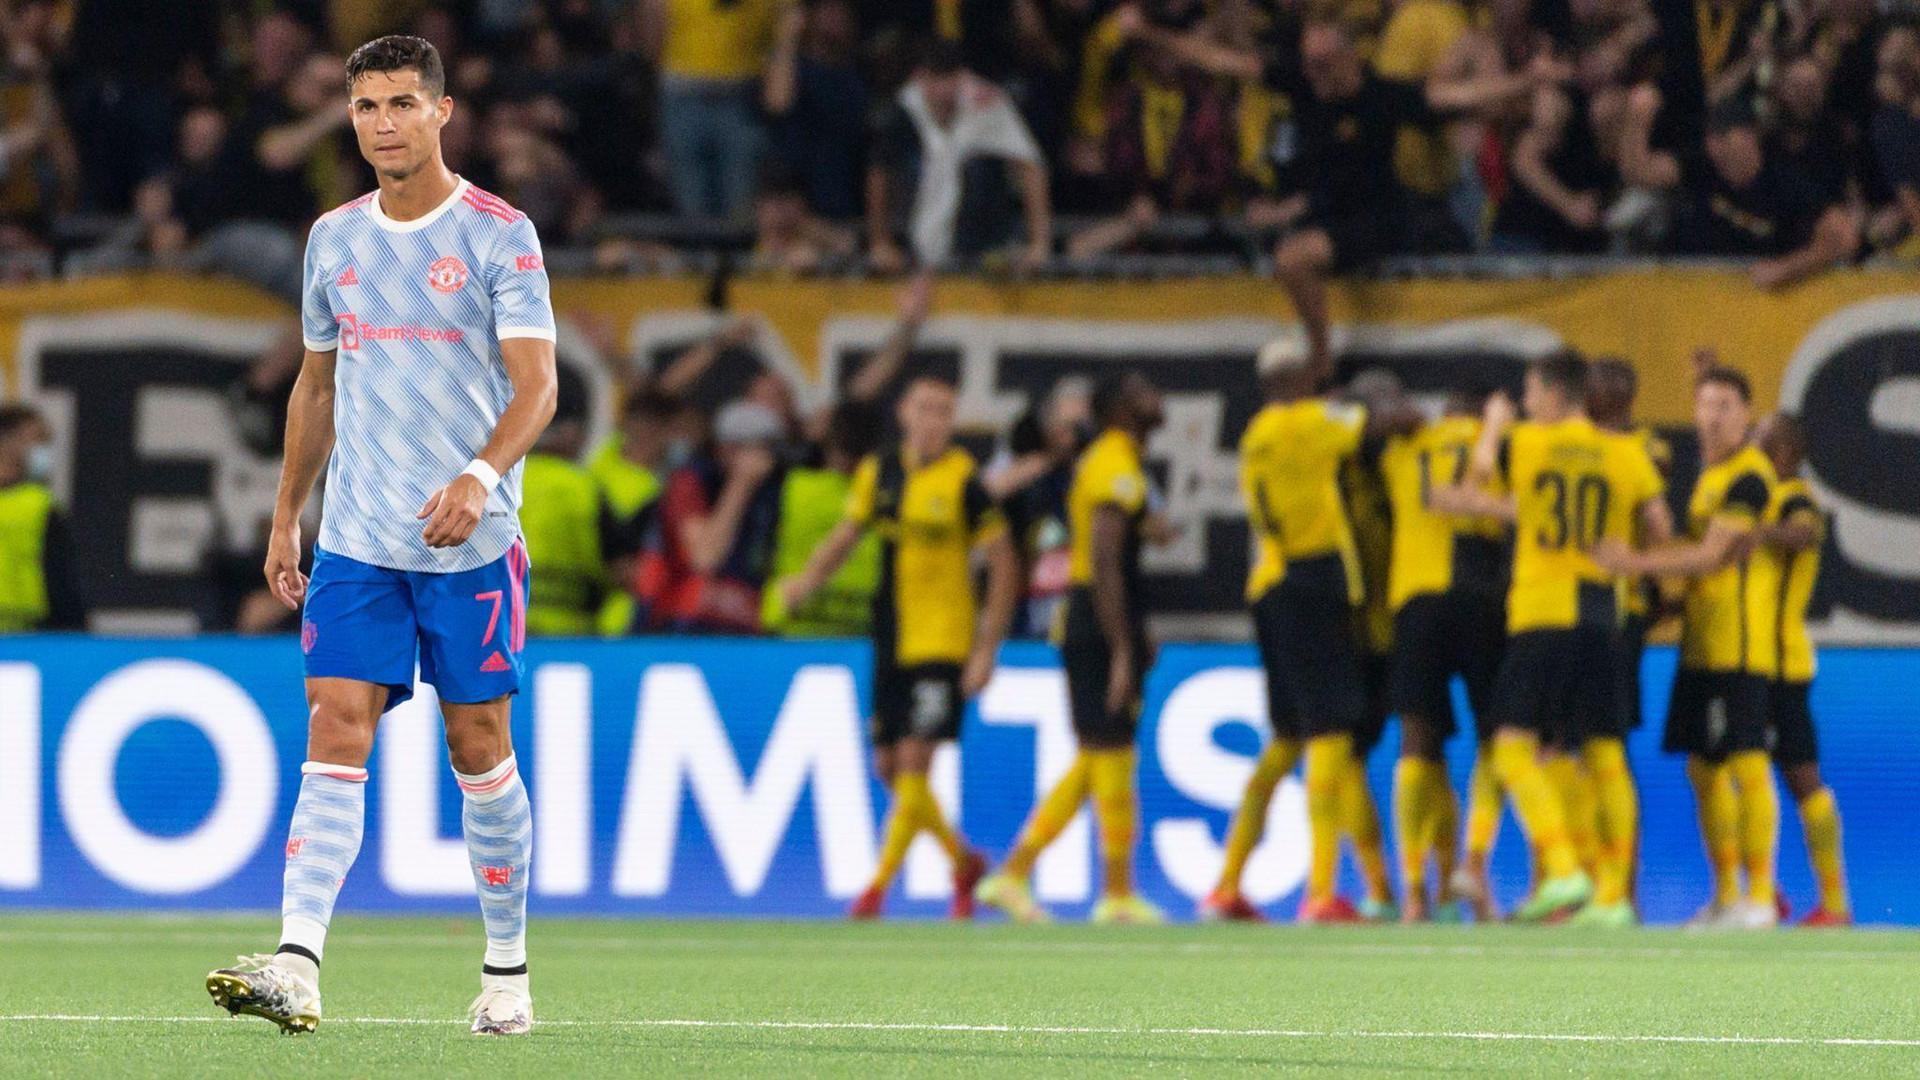 HLV Solskjaer sai lầm khiến Man Utd thua bẽ mặt ở Champions League - 2